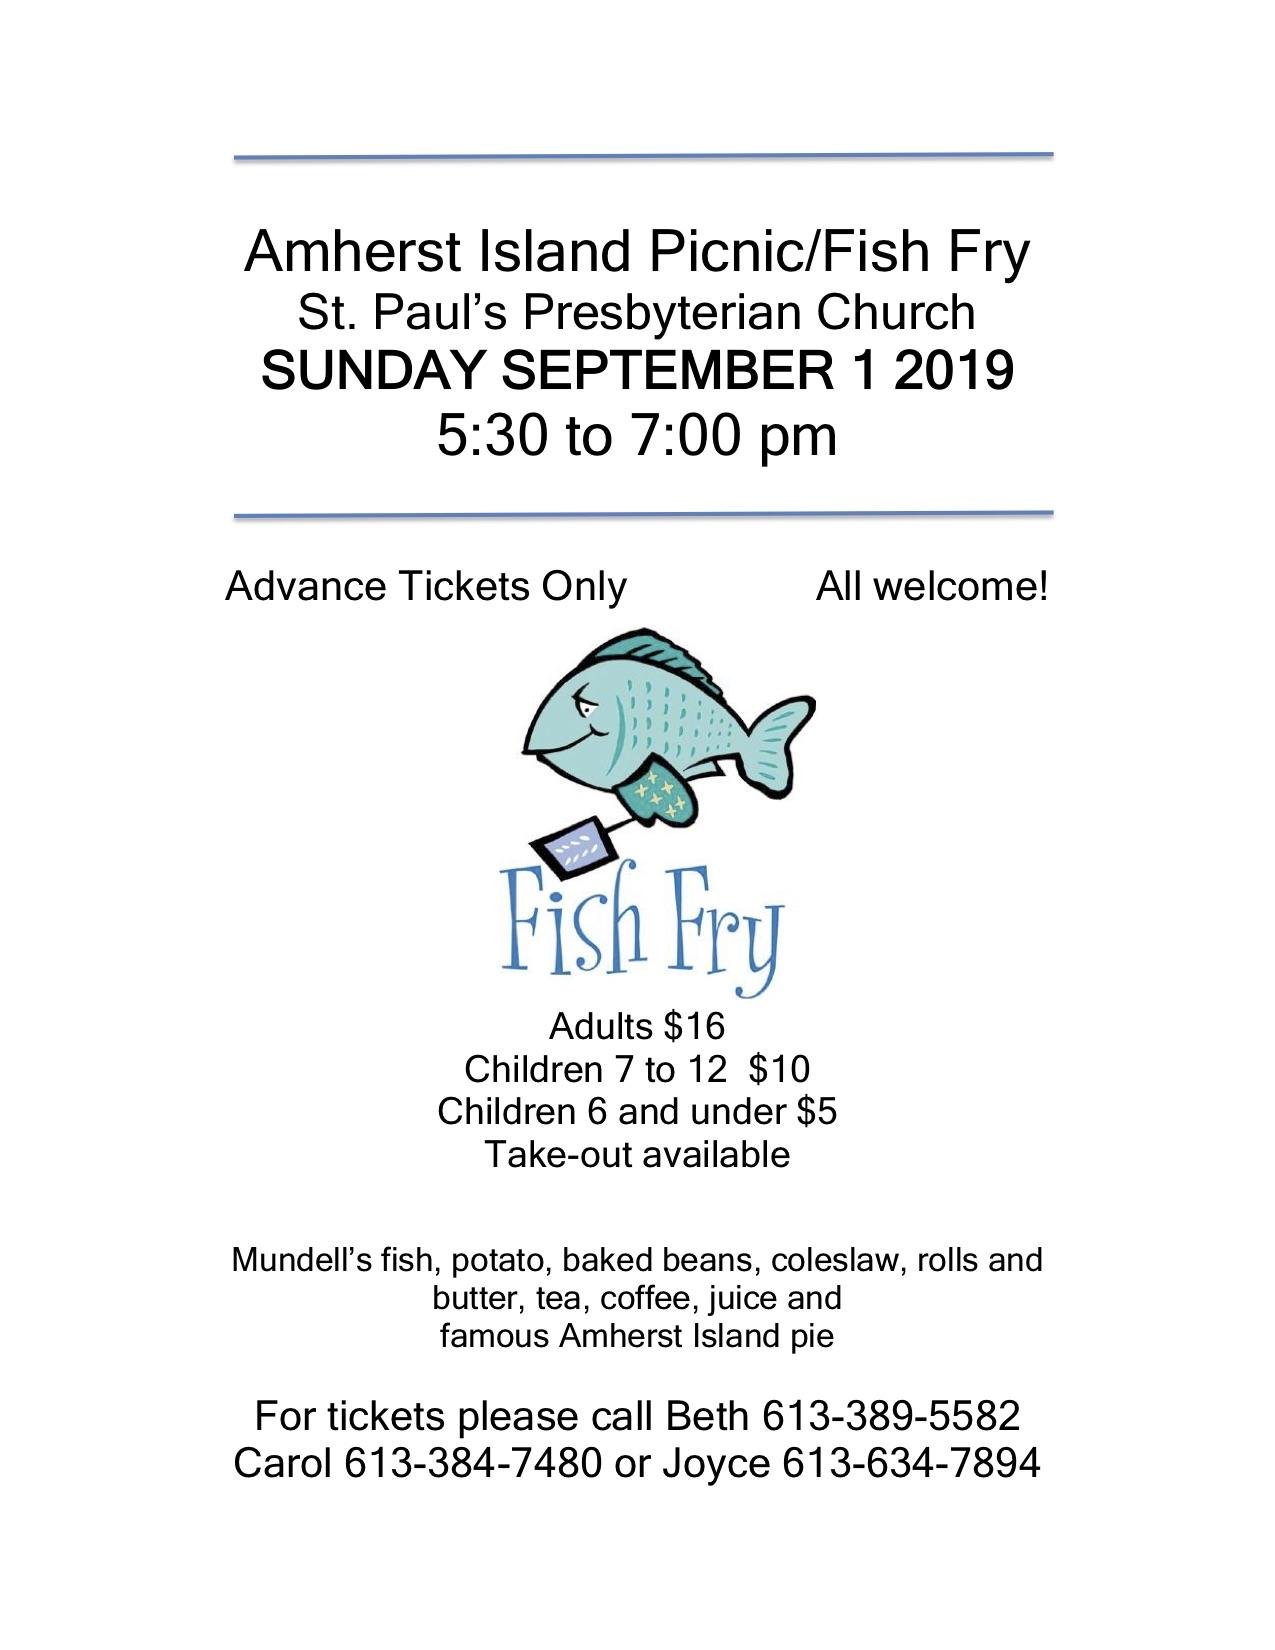 Fish Fry @ St. Paul's Presbyterian Church